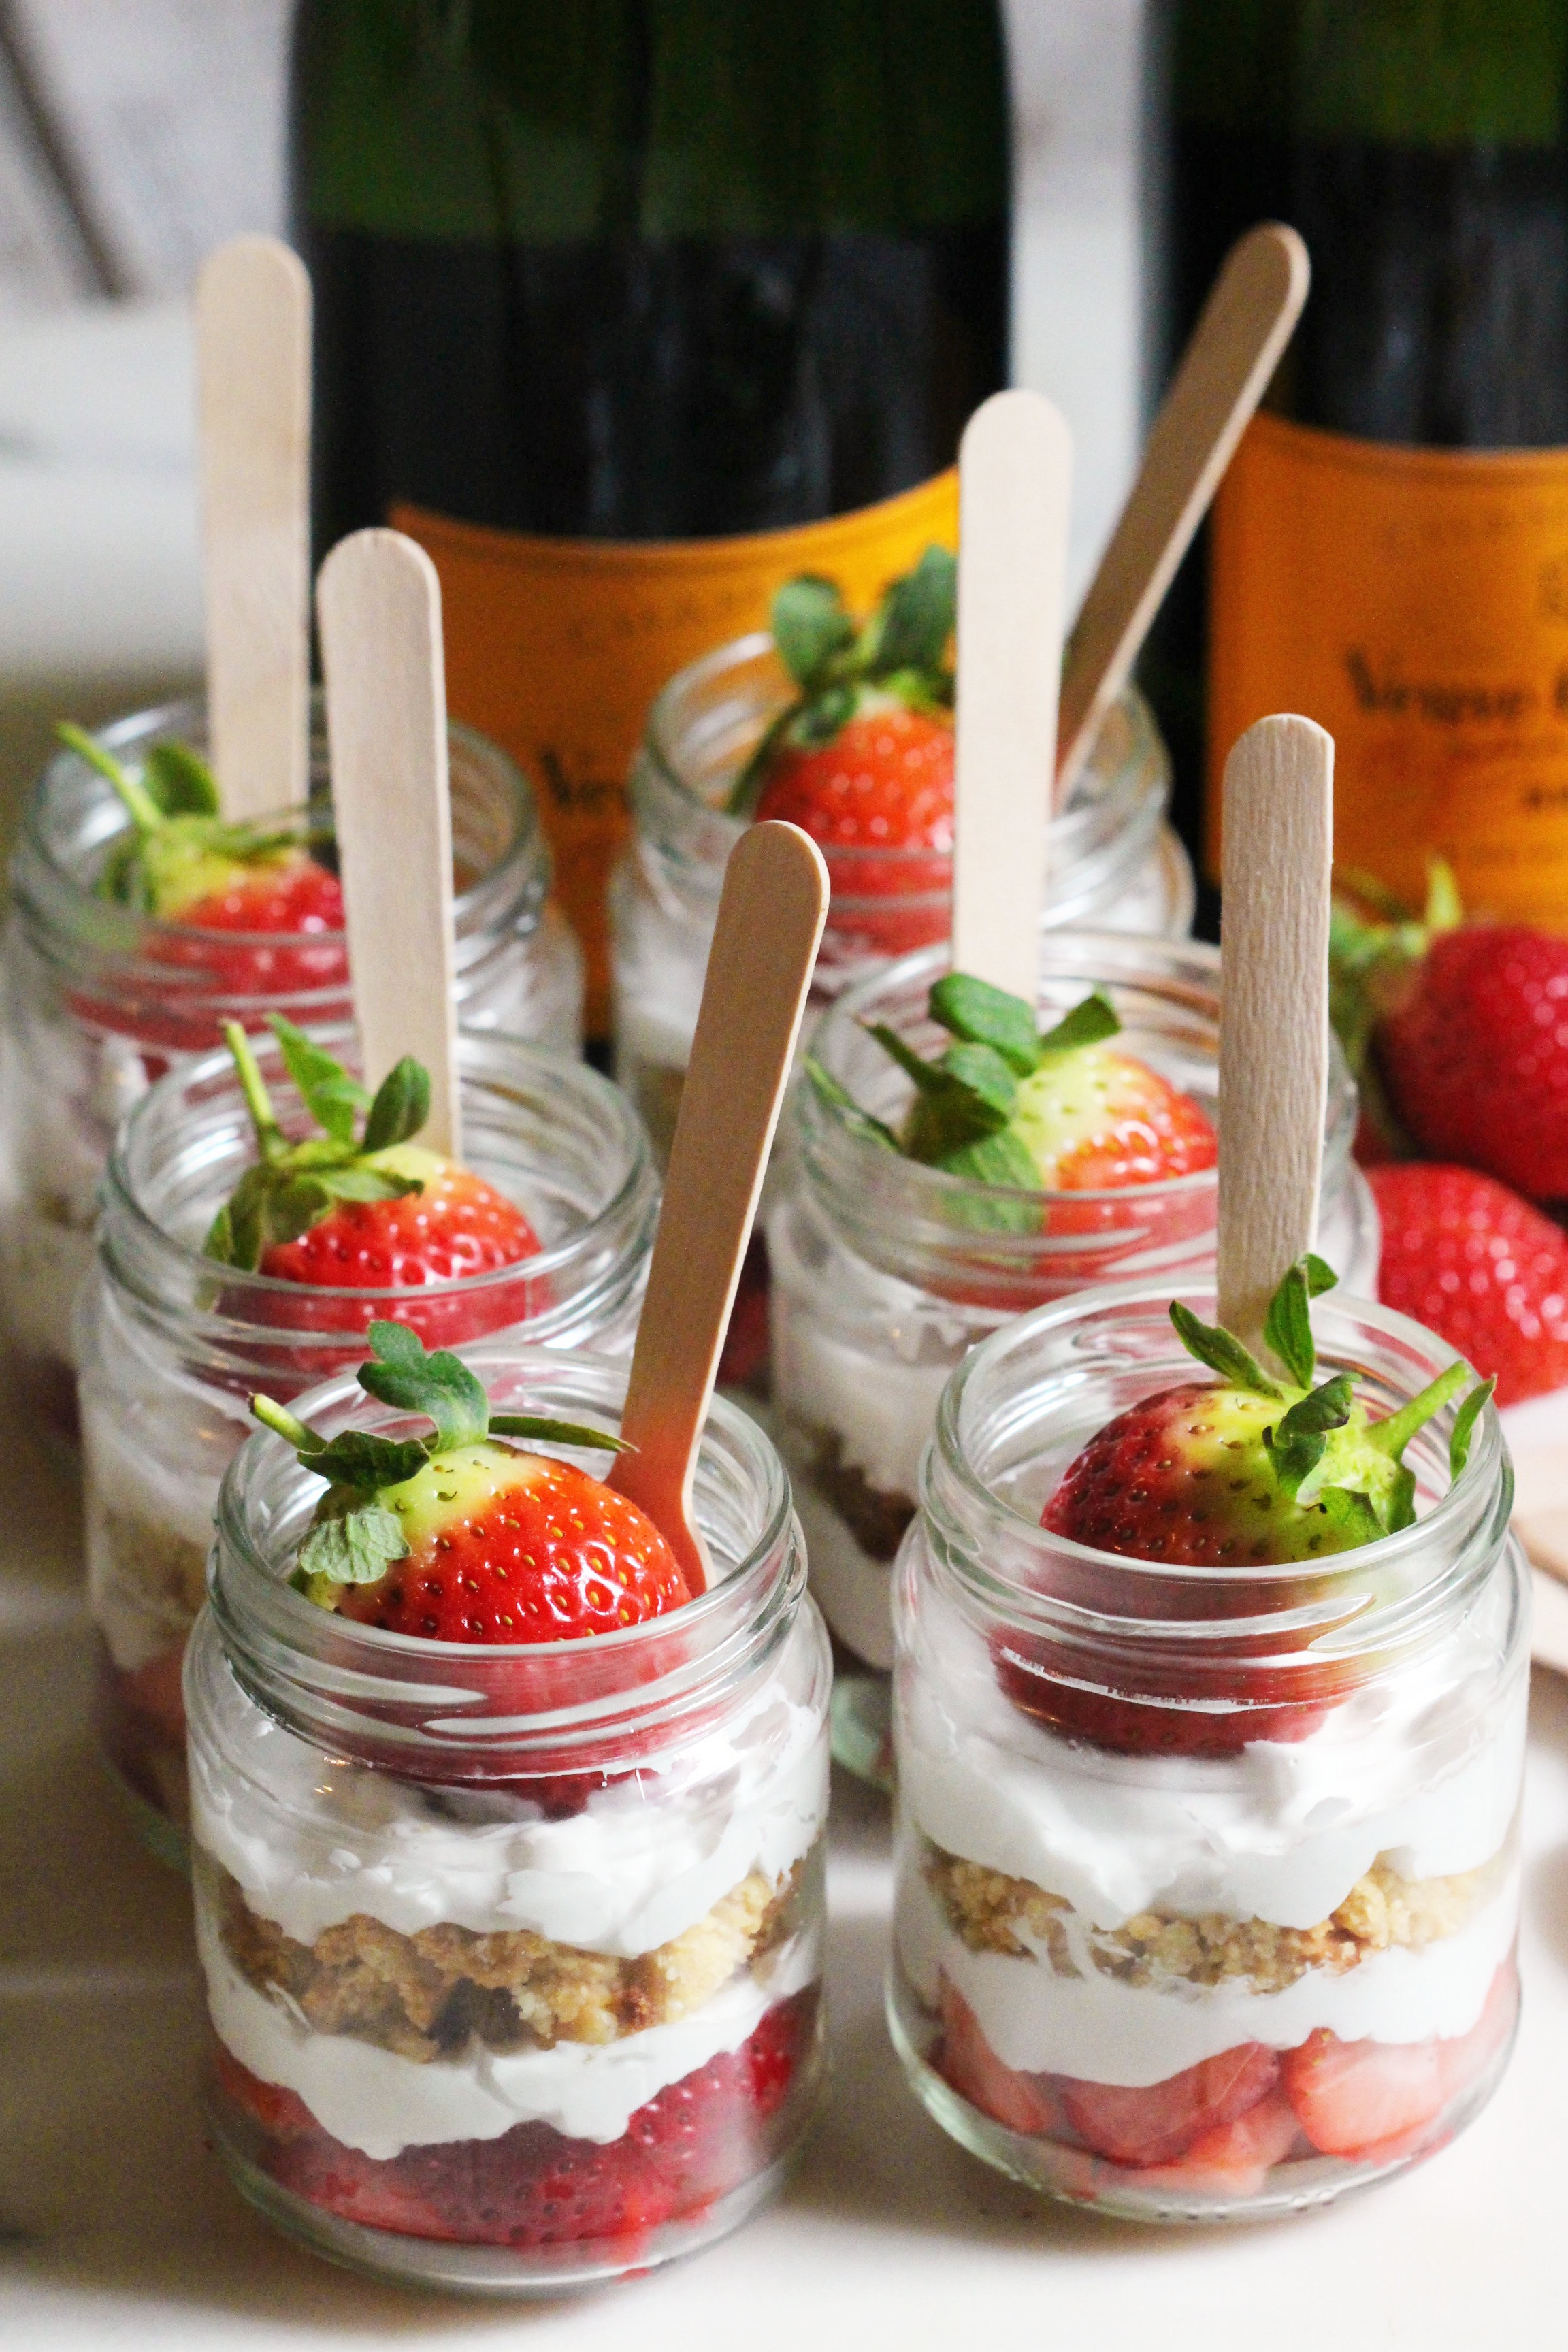 Strawberry Shortcake Pots 2